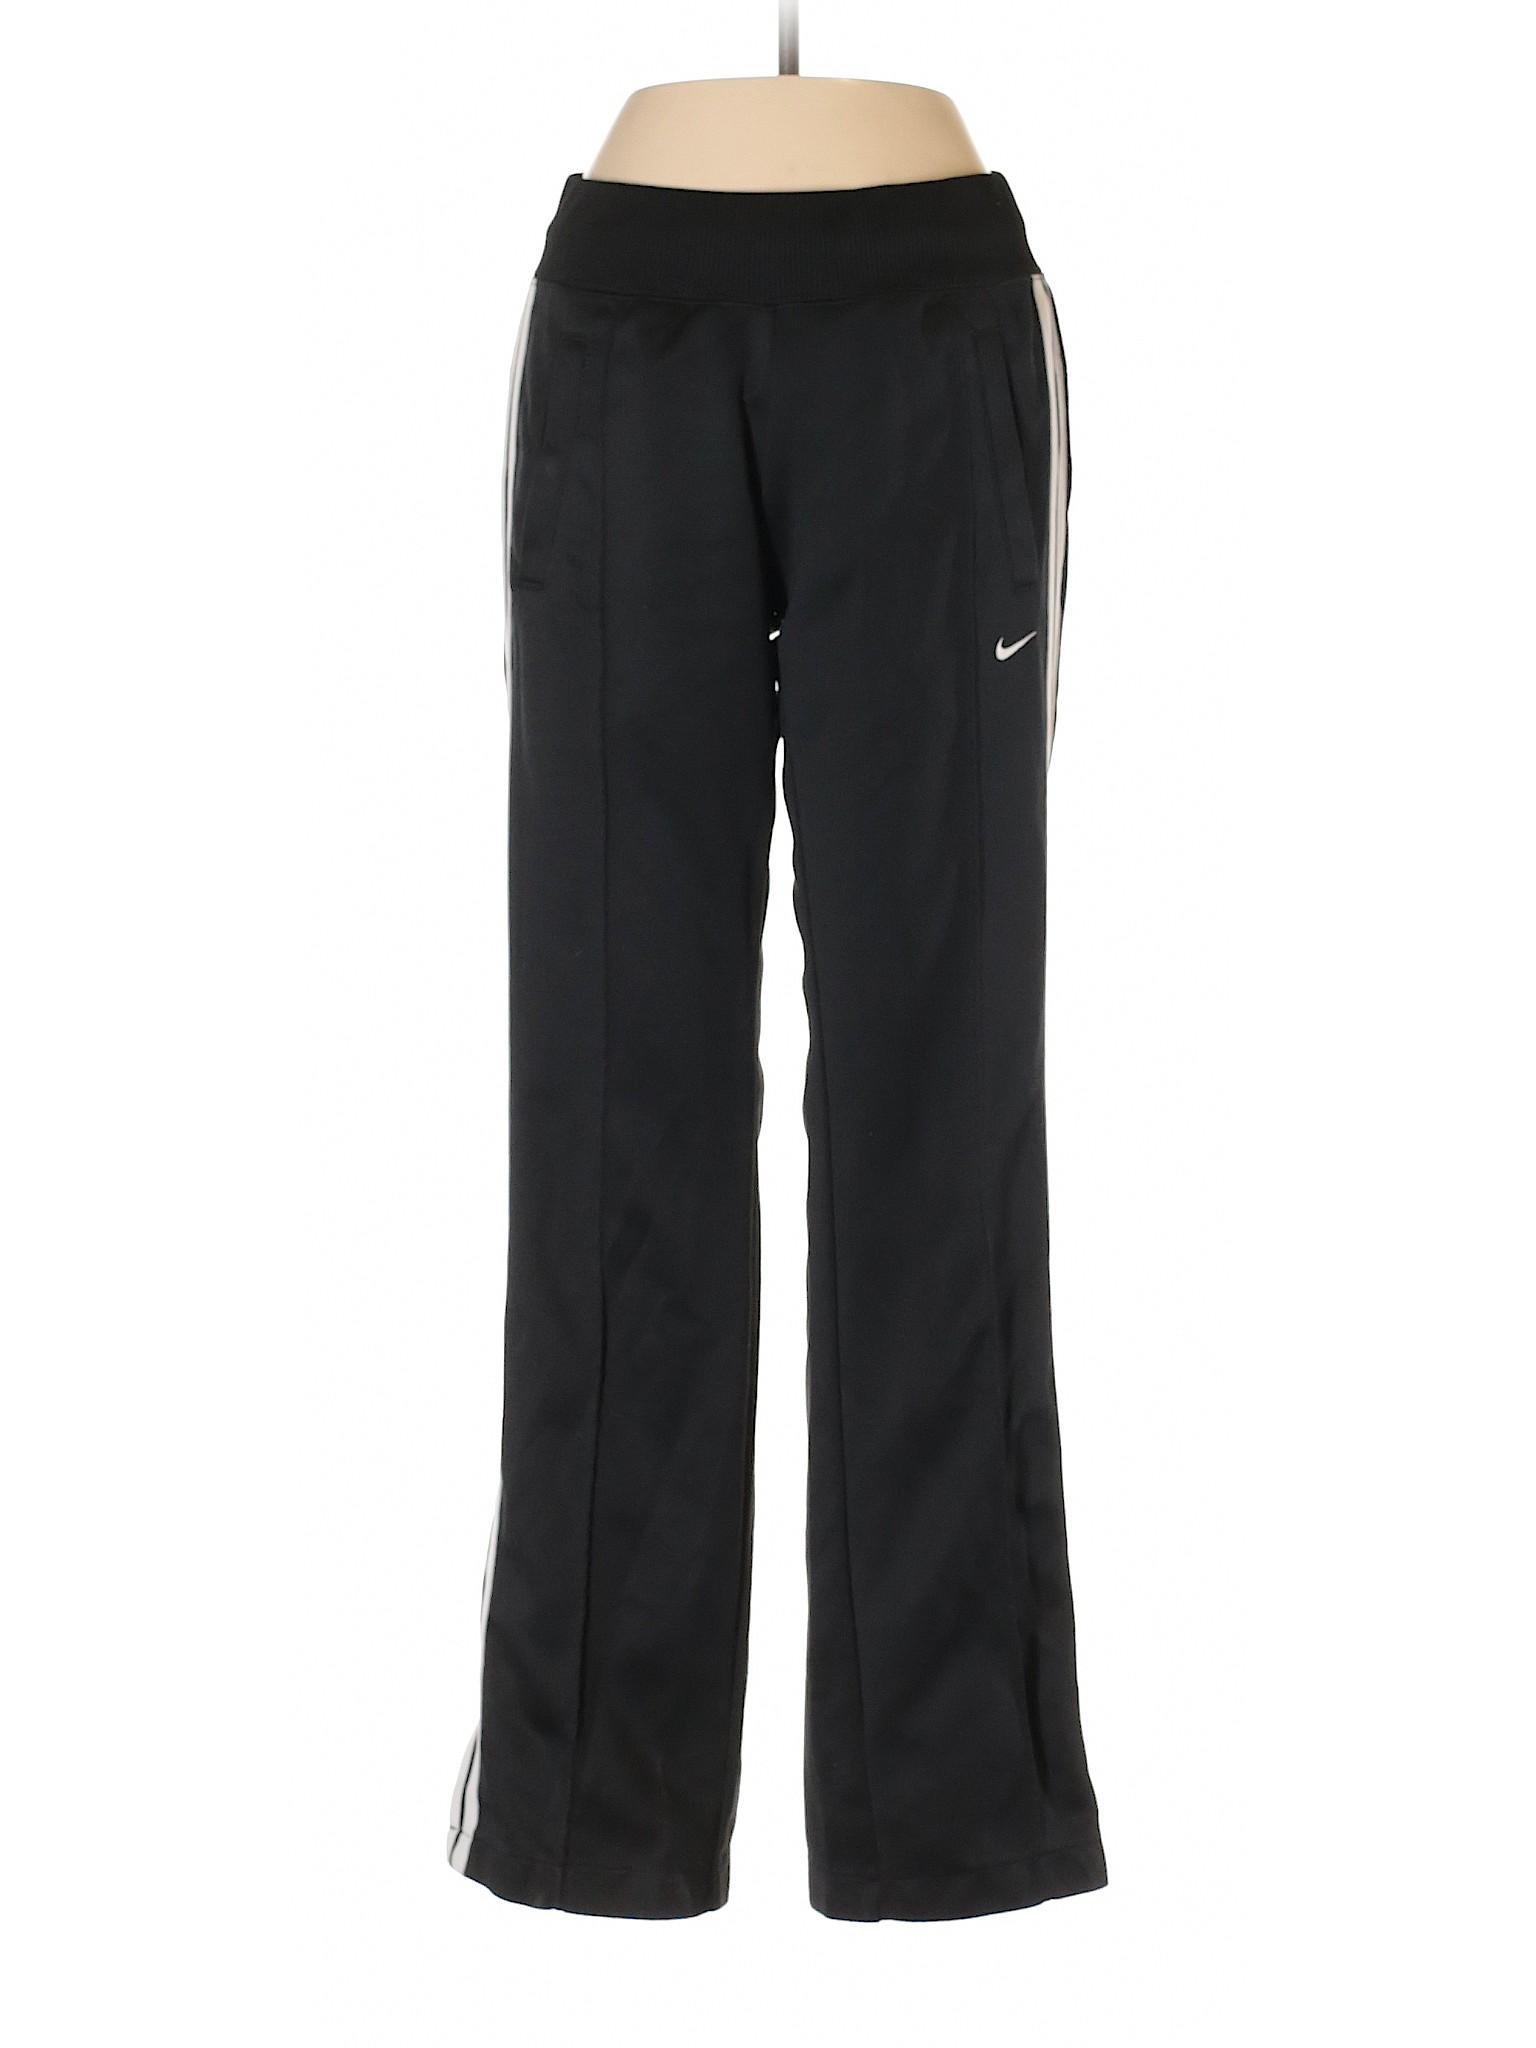 Nike Nike Boutique leisure Pants leisure Boutique Boutique leisure Active Active Pants qWgpwnq4